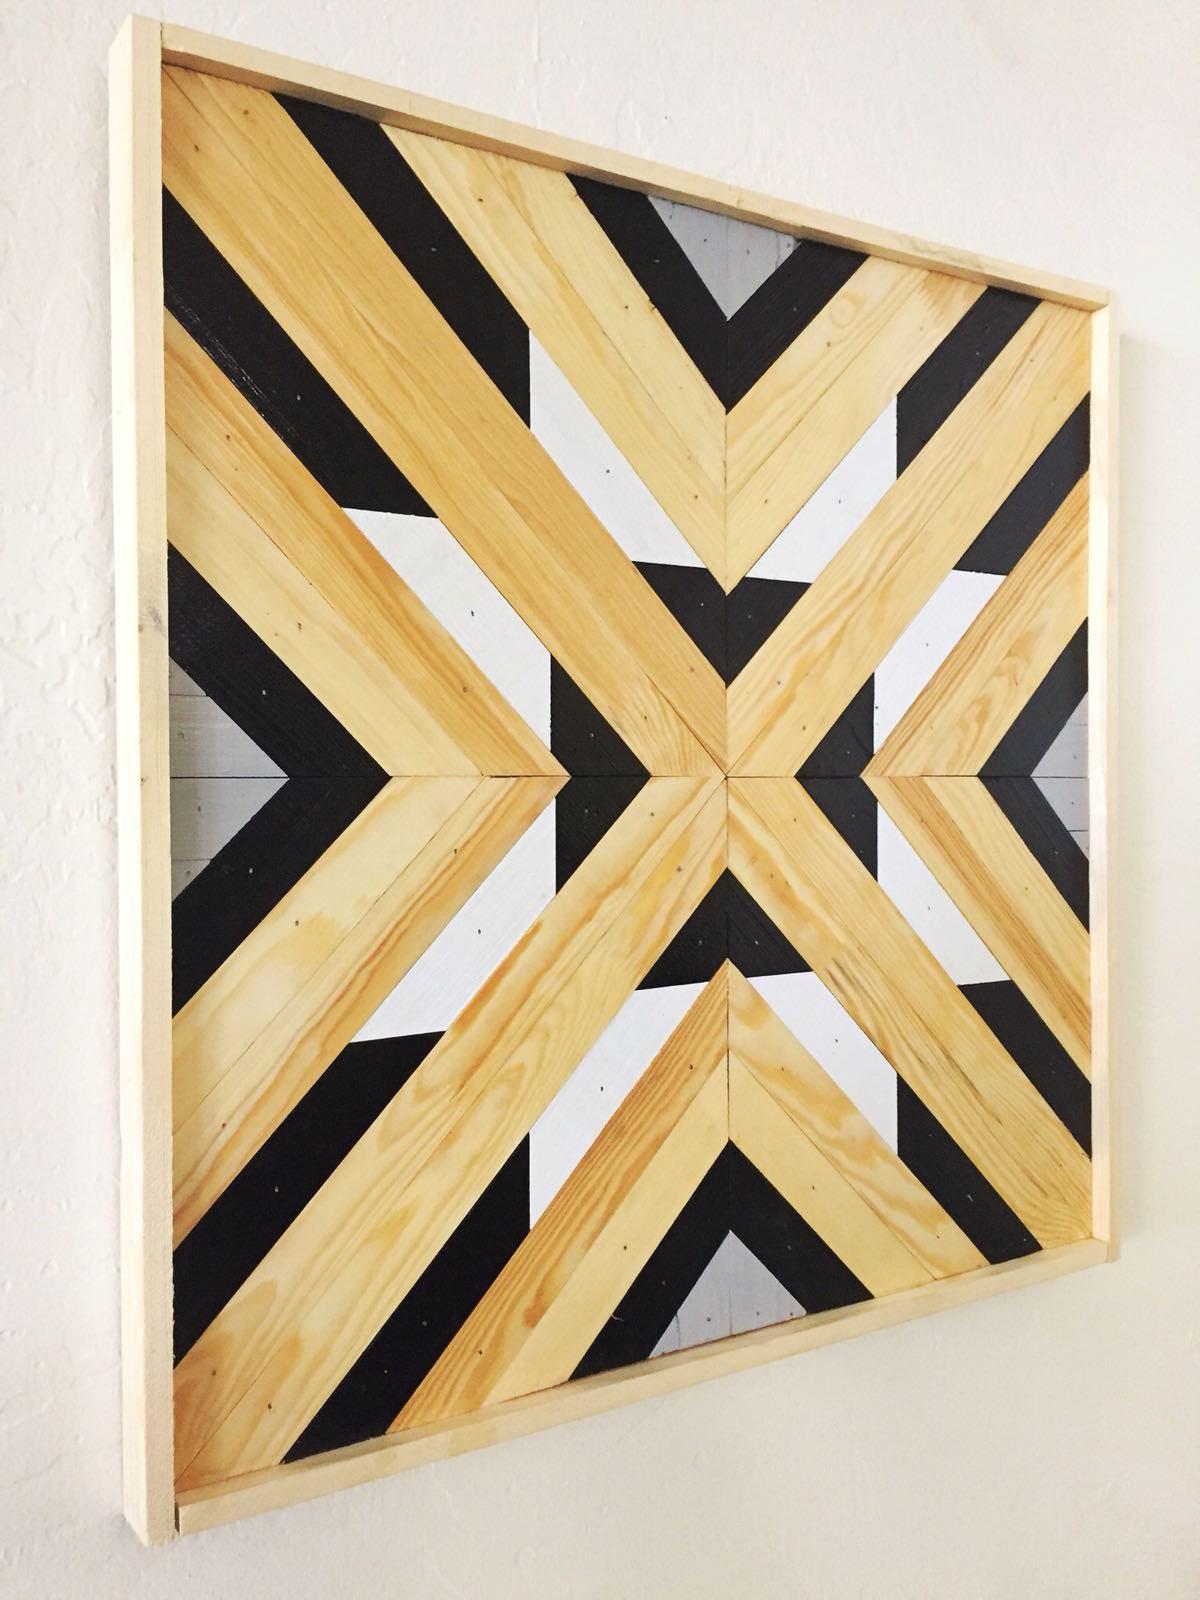 Wood Wall Art, Modern and Decorative Wall Art Wood Panel, Large Wood ...